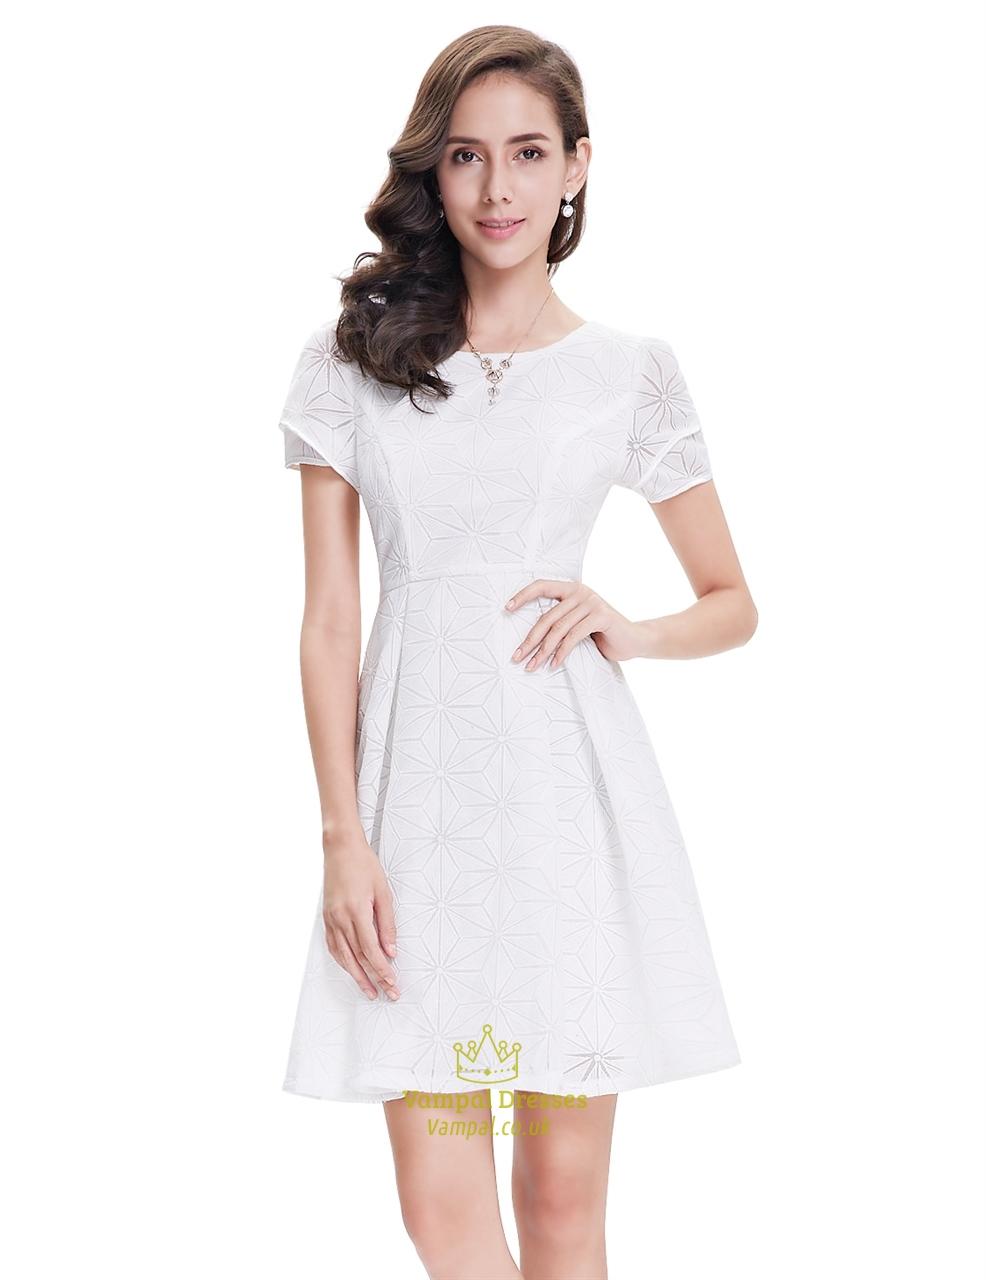 Slim Fit Cotton Fine Line Stripe Dress Shirt Slim Fit Cotton Fine Line Stripe Dress Free Exchanges· Simple Returns· Big & Tall Sizes· Quality Menswear/10 (37K reviews).